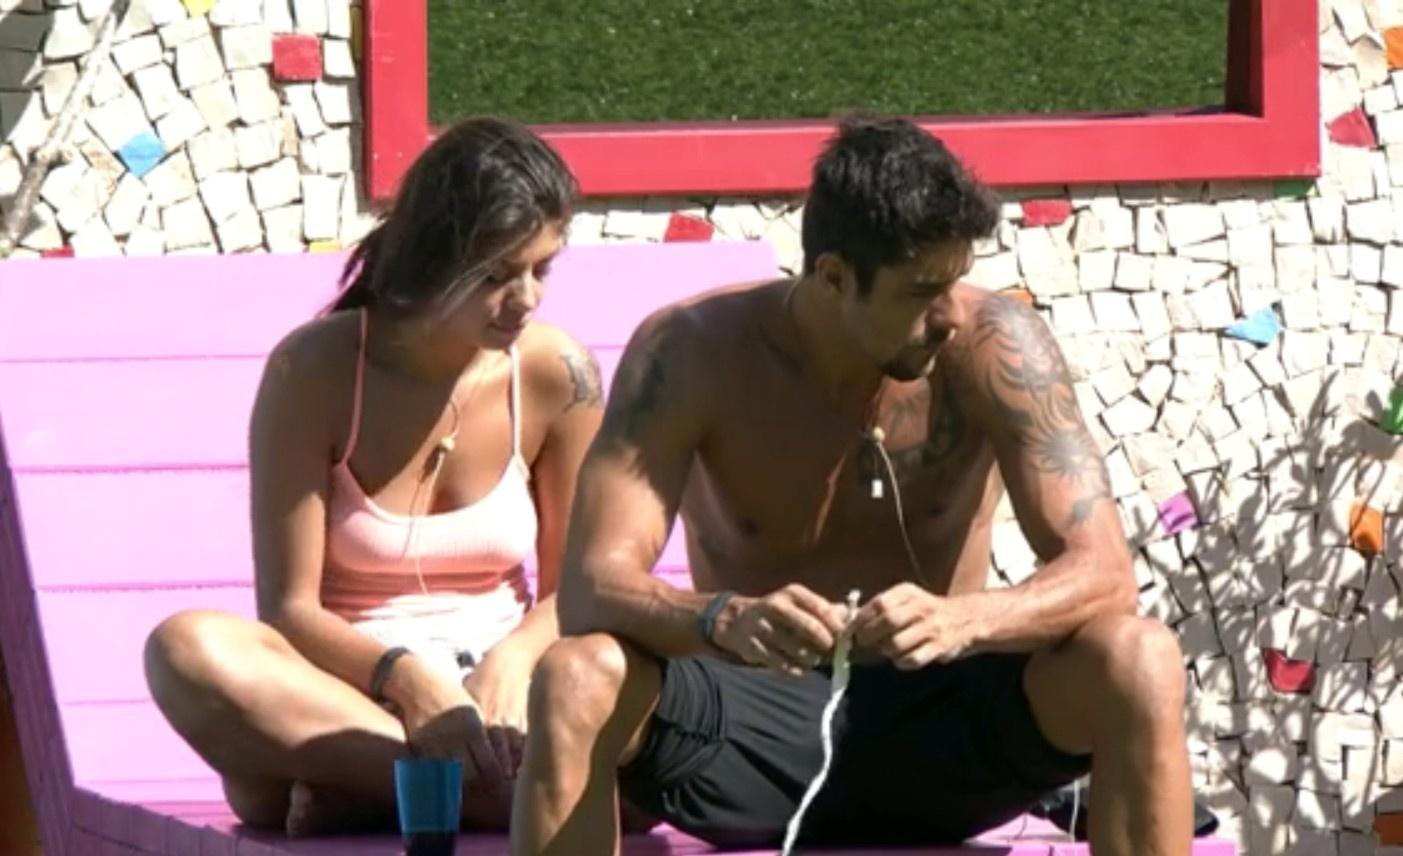 26.jan.2014 - Franciele e Diego conversam no jardim